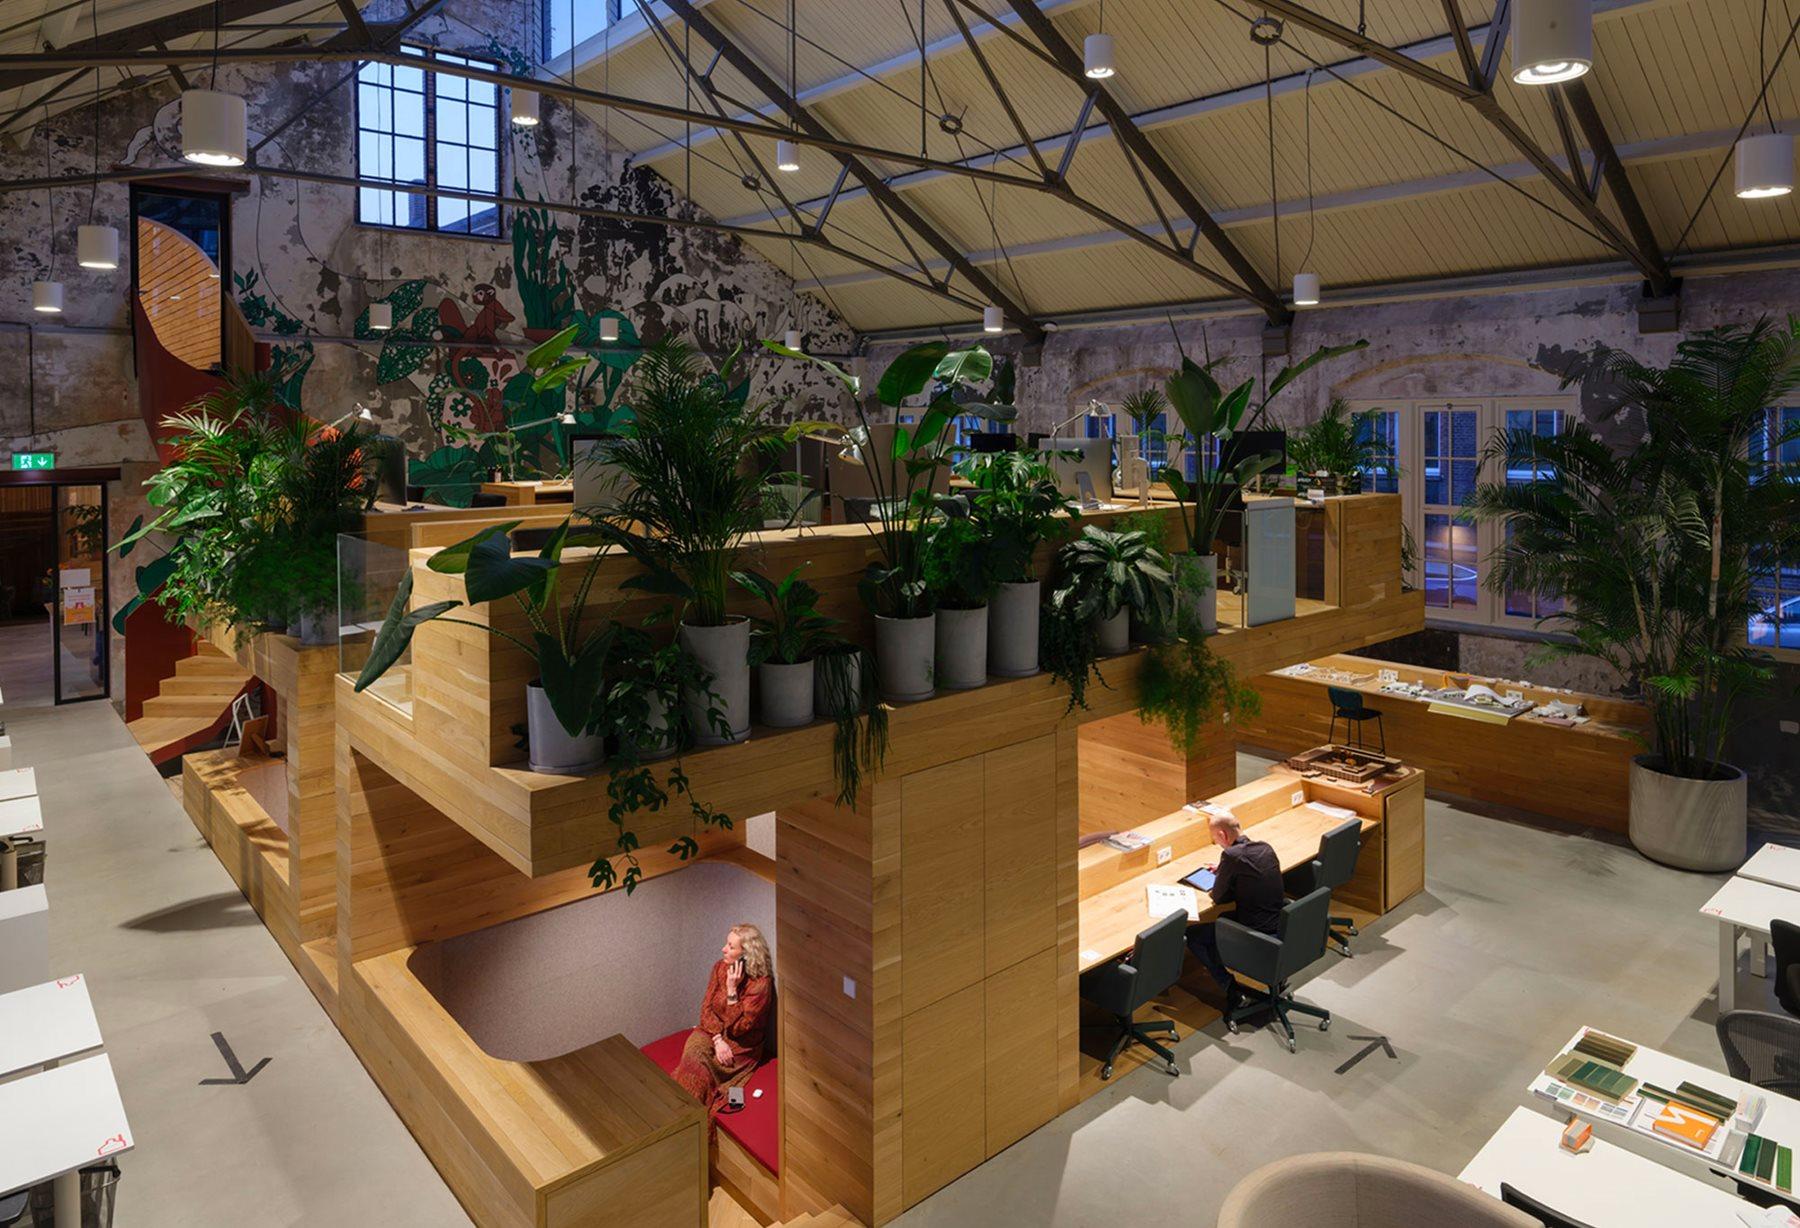 The Vakwerk architectural studio headquarters